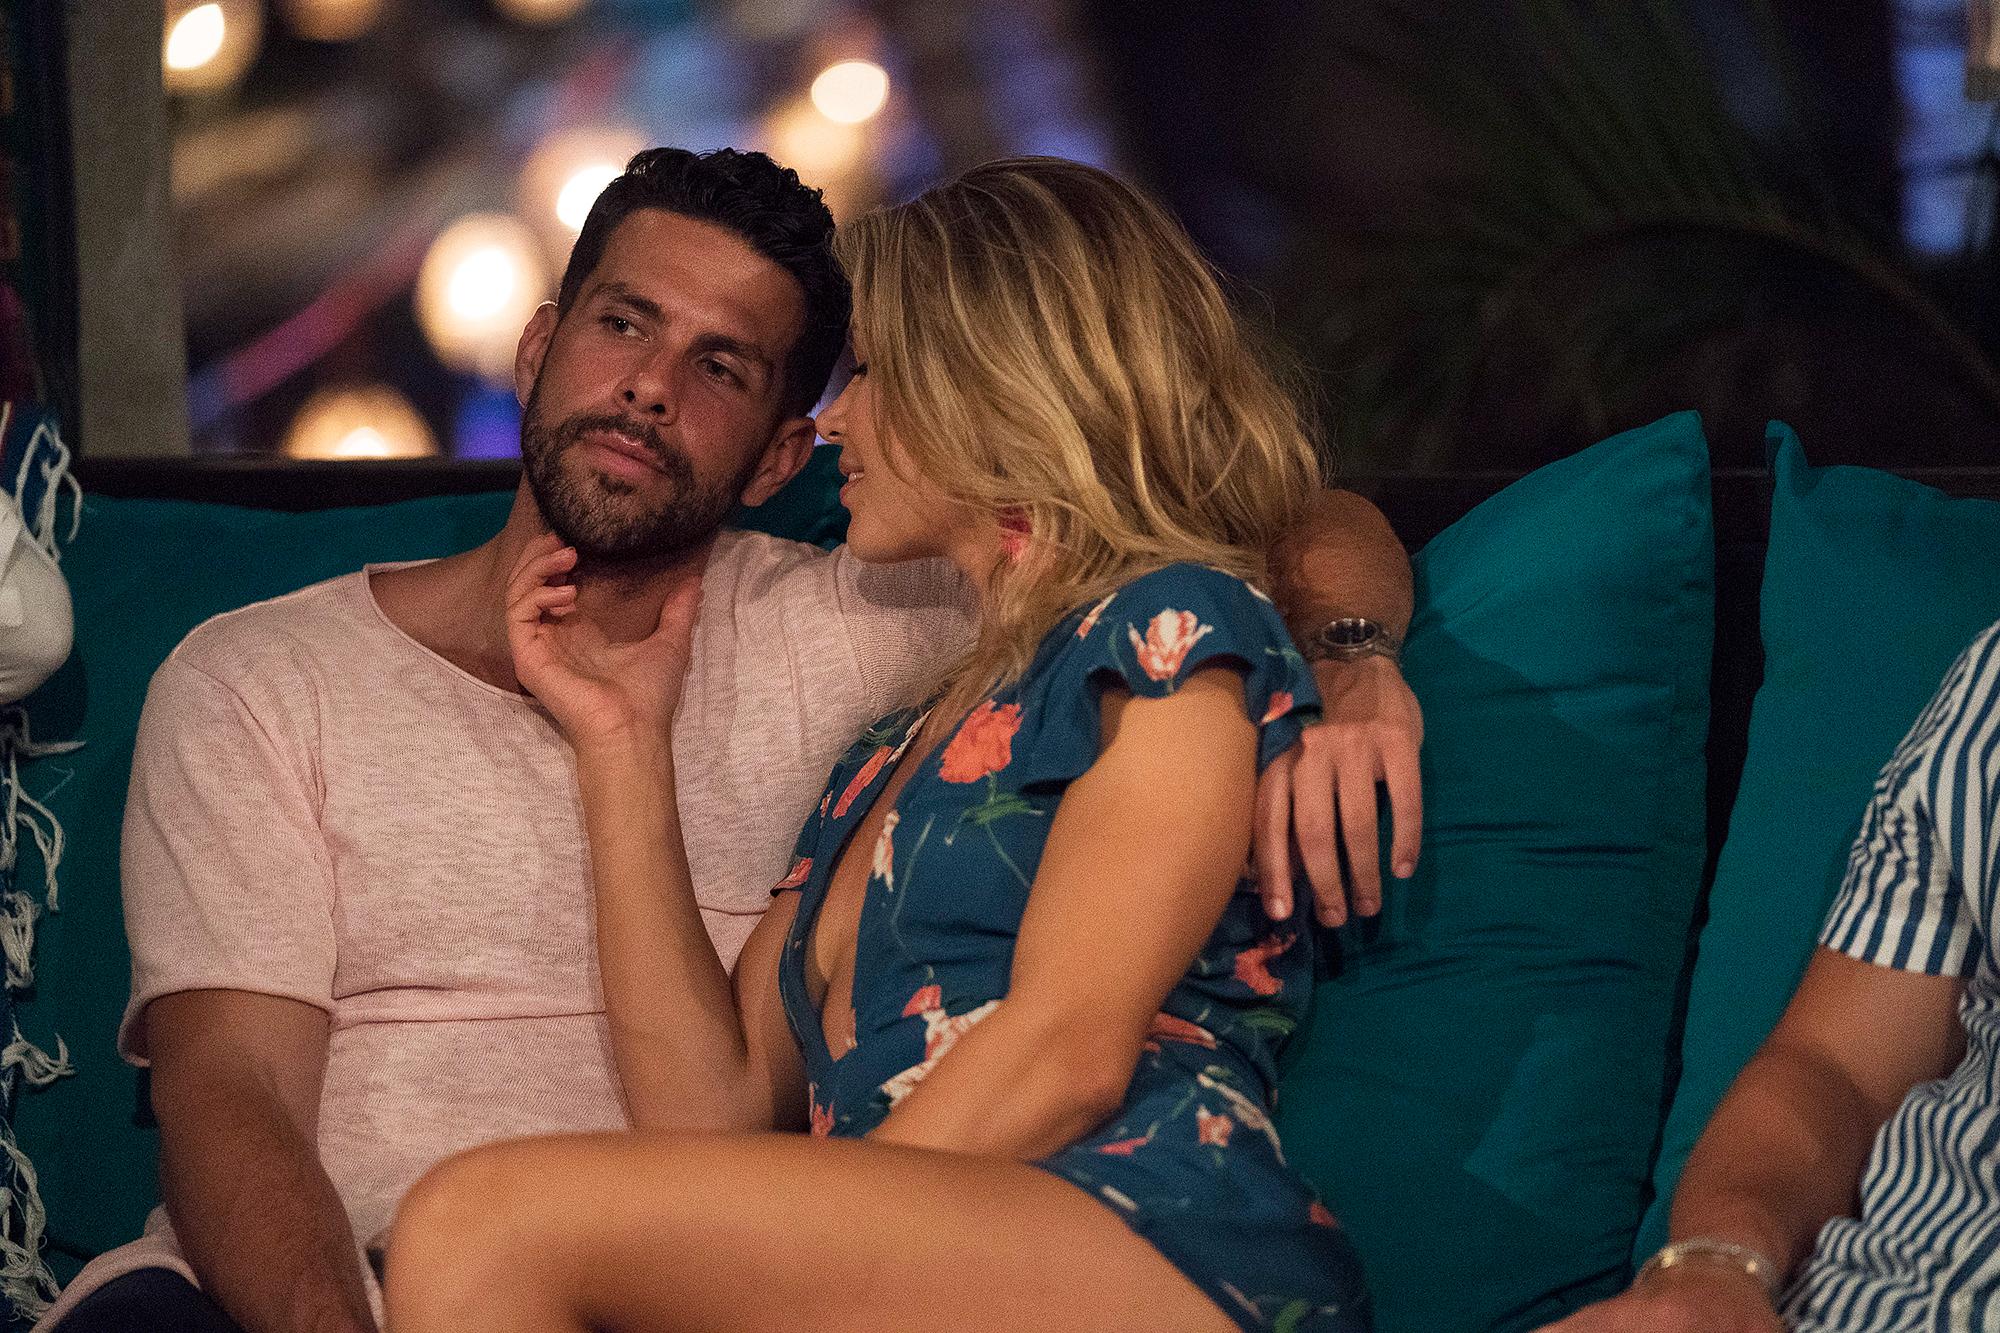 Bachelor in Paradise's Chris Randone Gushes Over 'Ride-or-Die Partner' Krystal Nielson